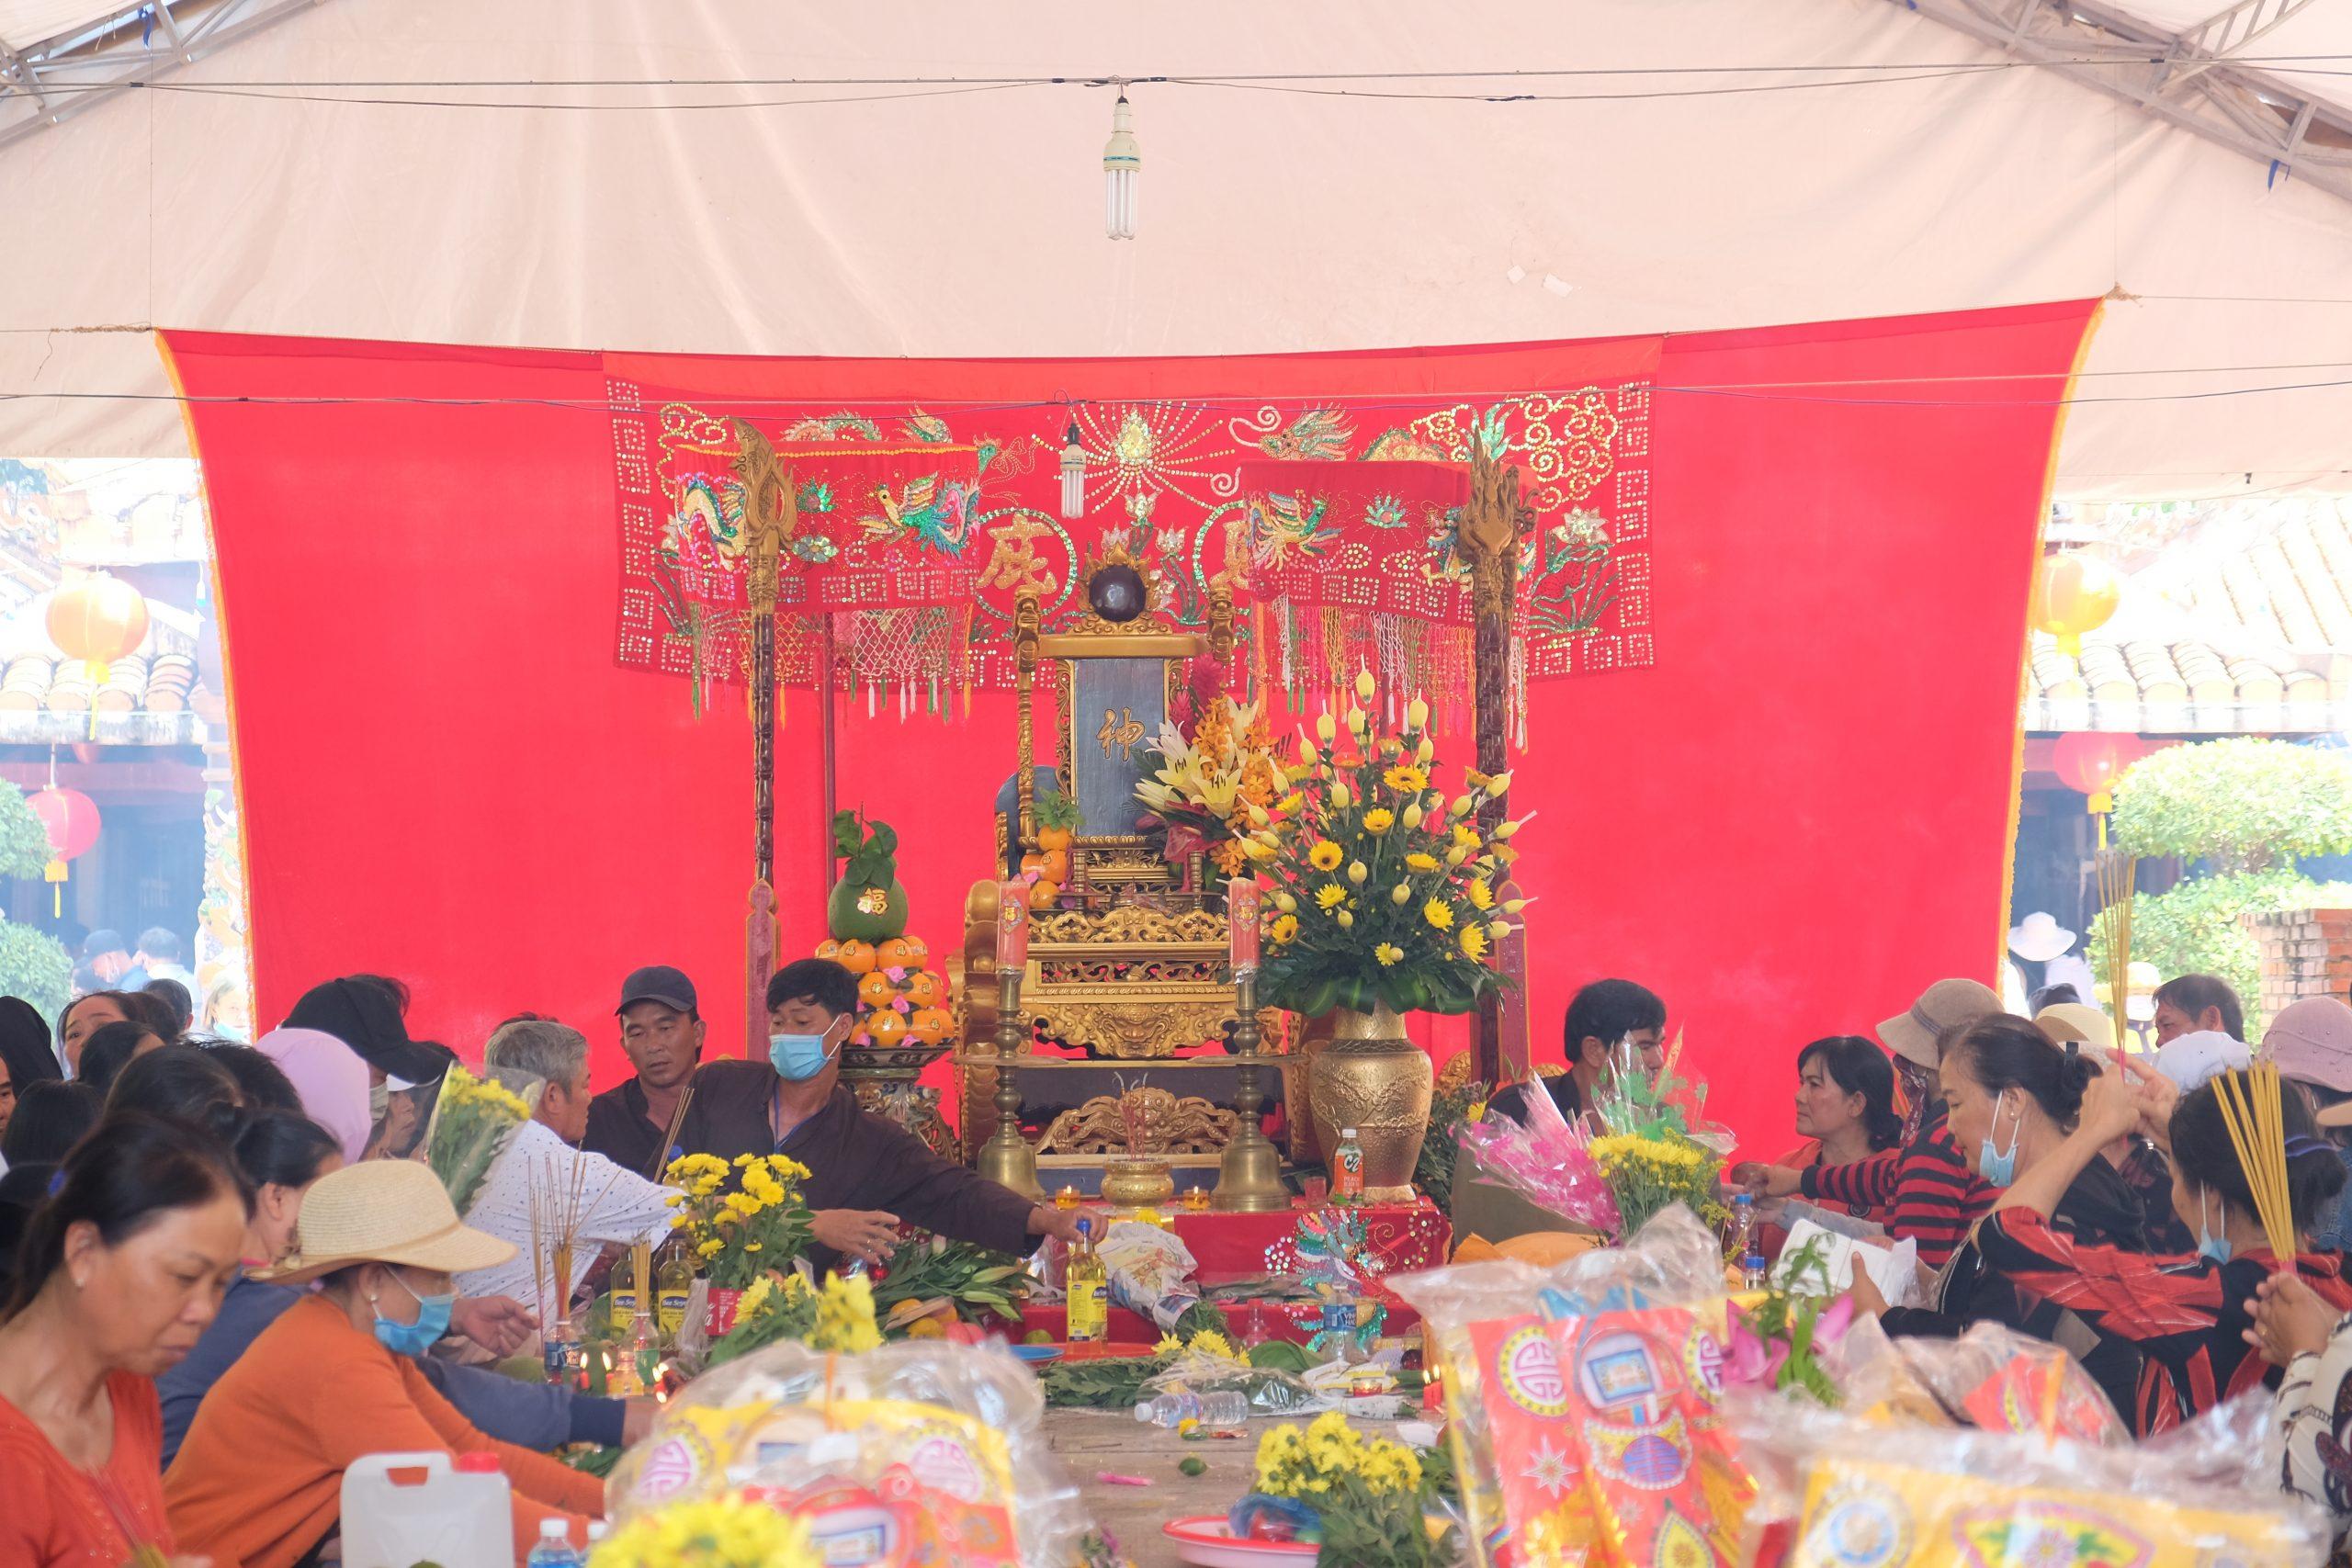 Le hoi dinh Thay Thim 2020 – 13